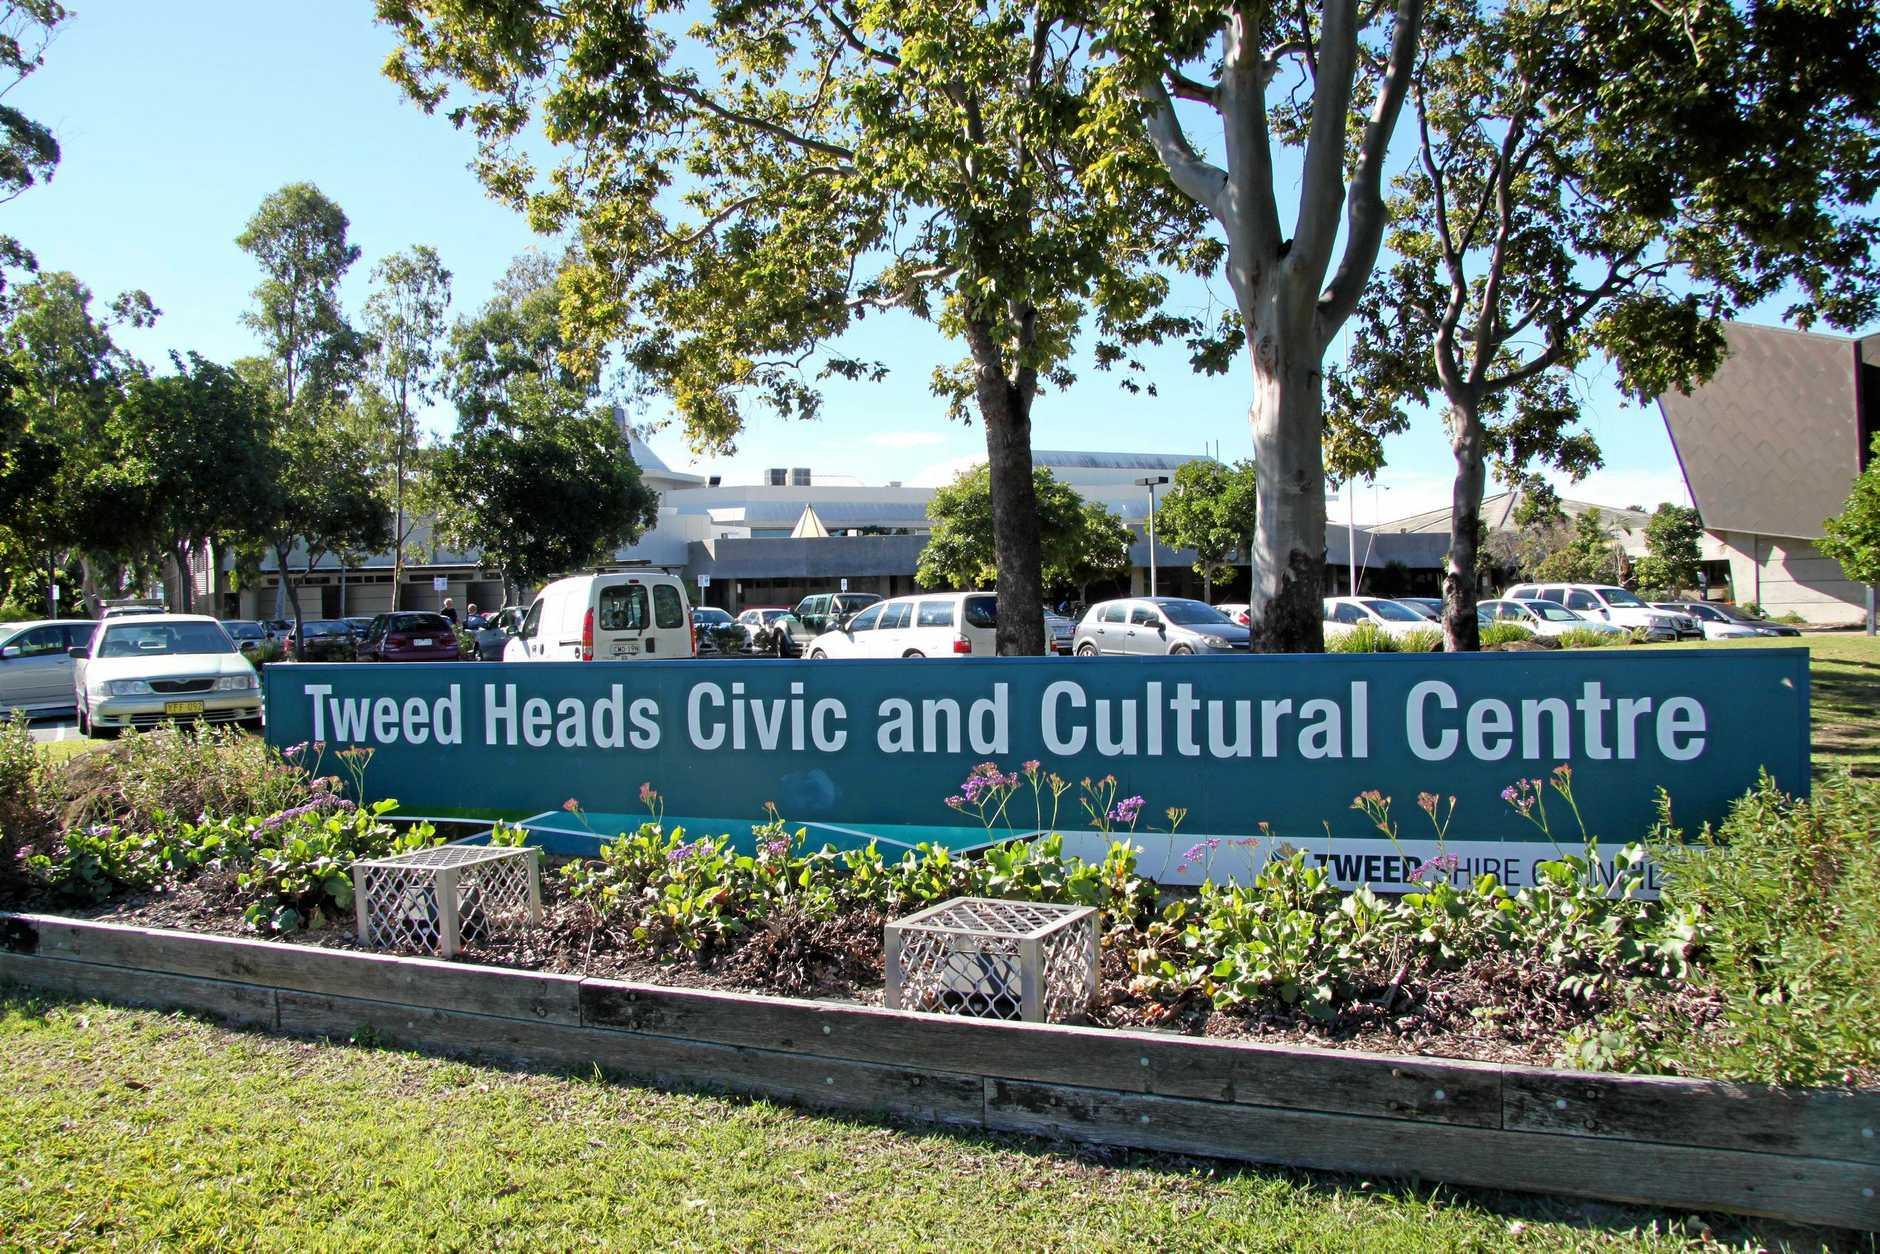 Tweed Heads Civic Centre